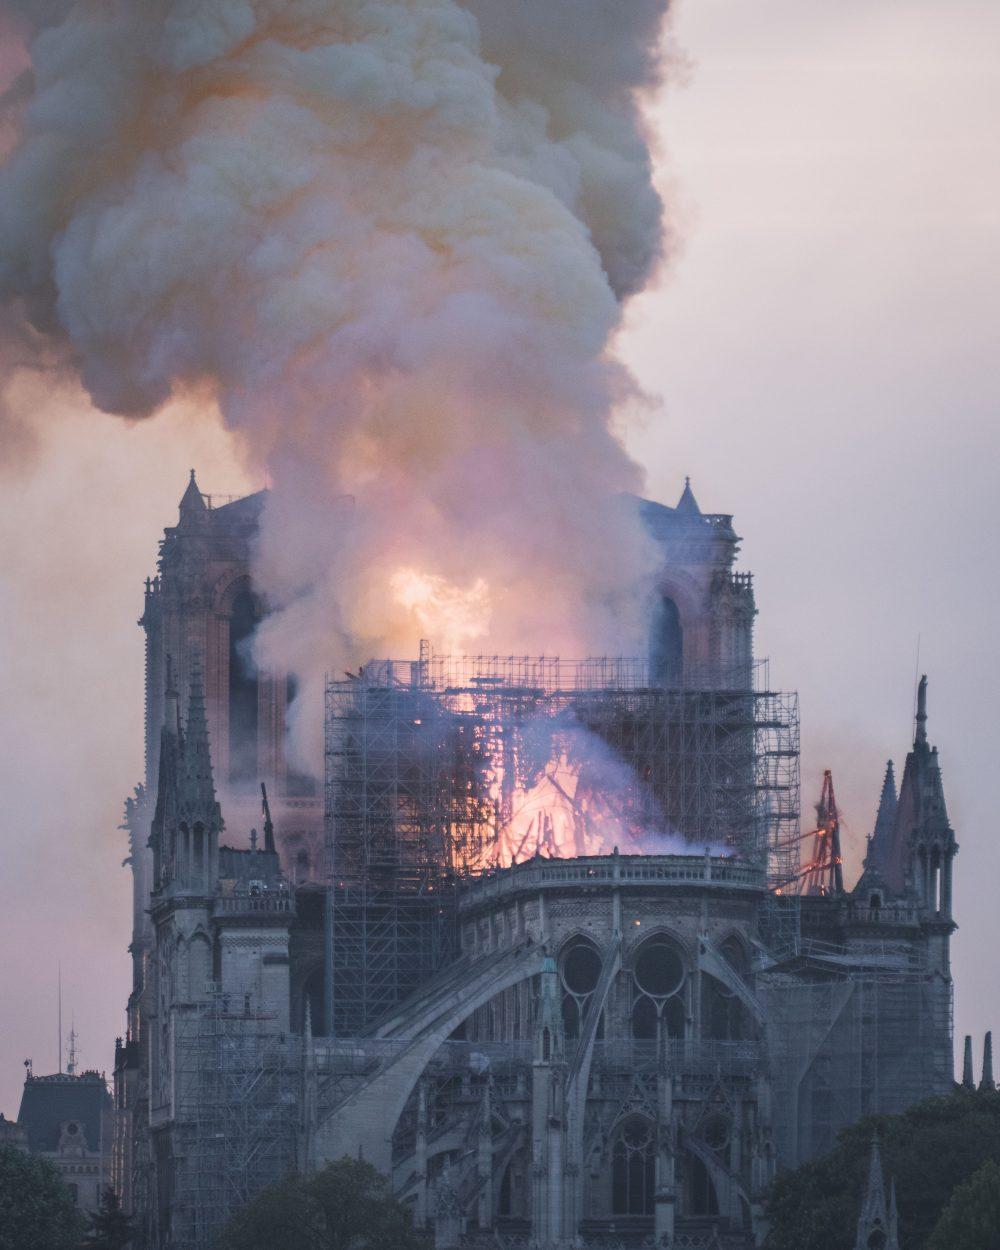 Iranian Baha'i Architect Farnaz Mansuri on the Notre Dame Cathedral Burning